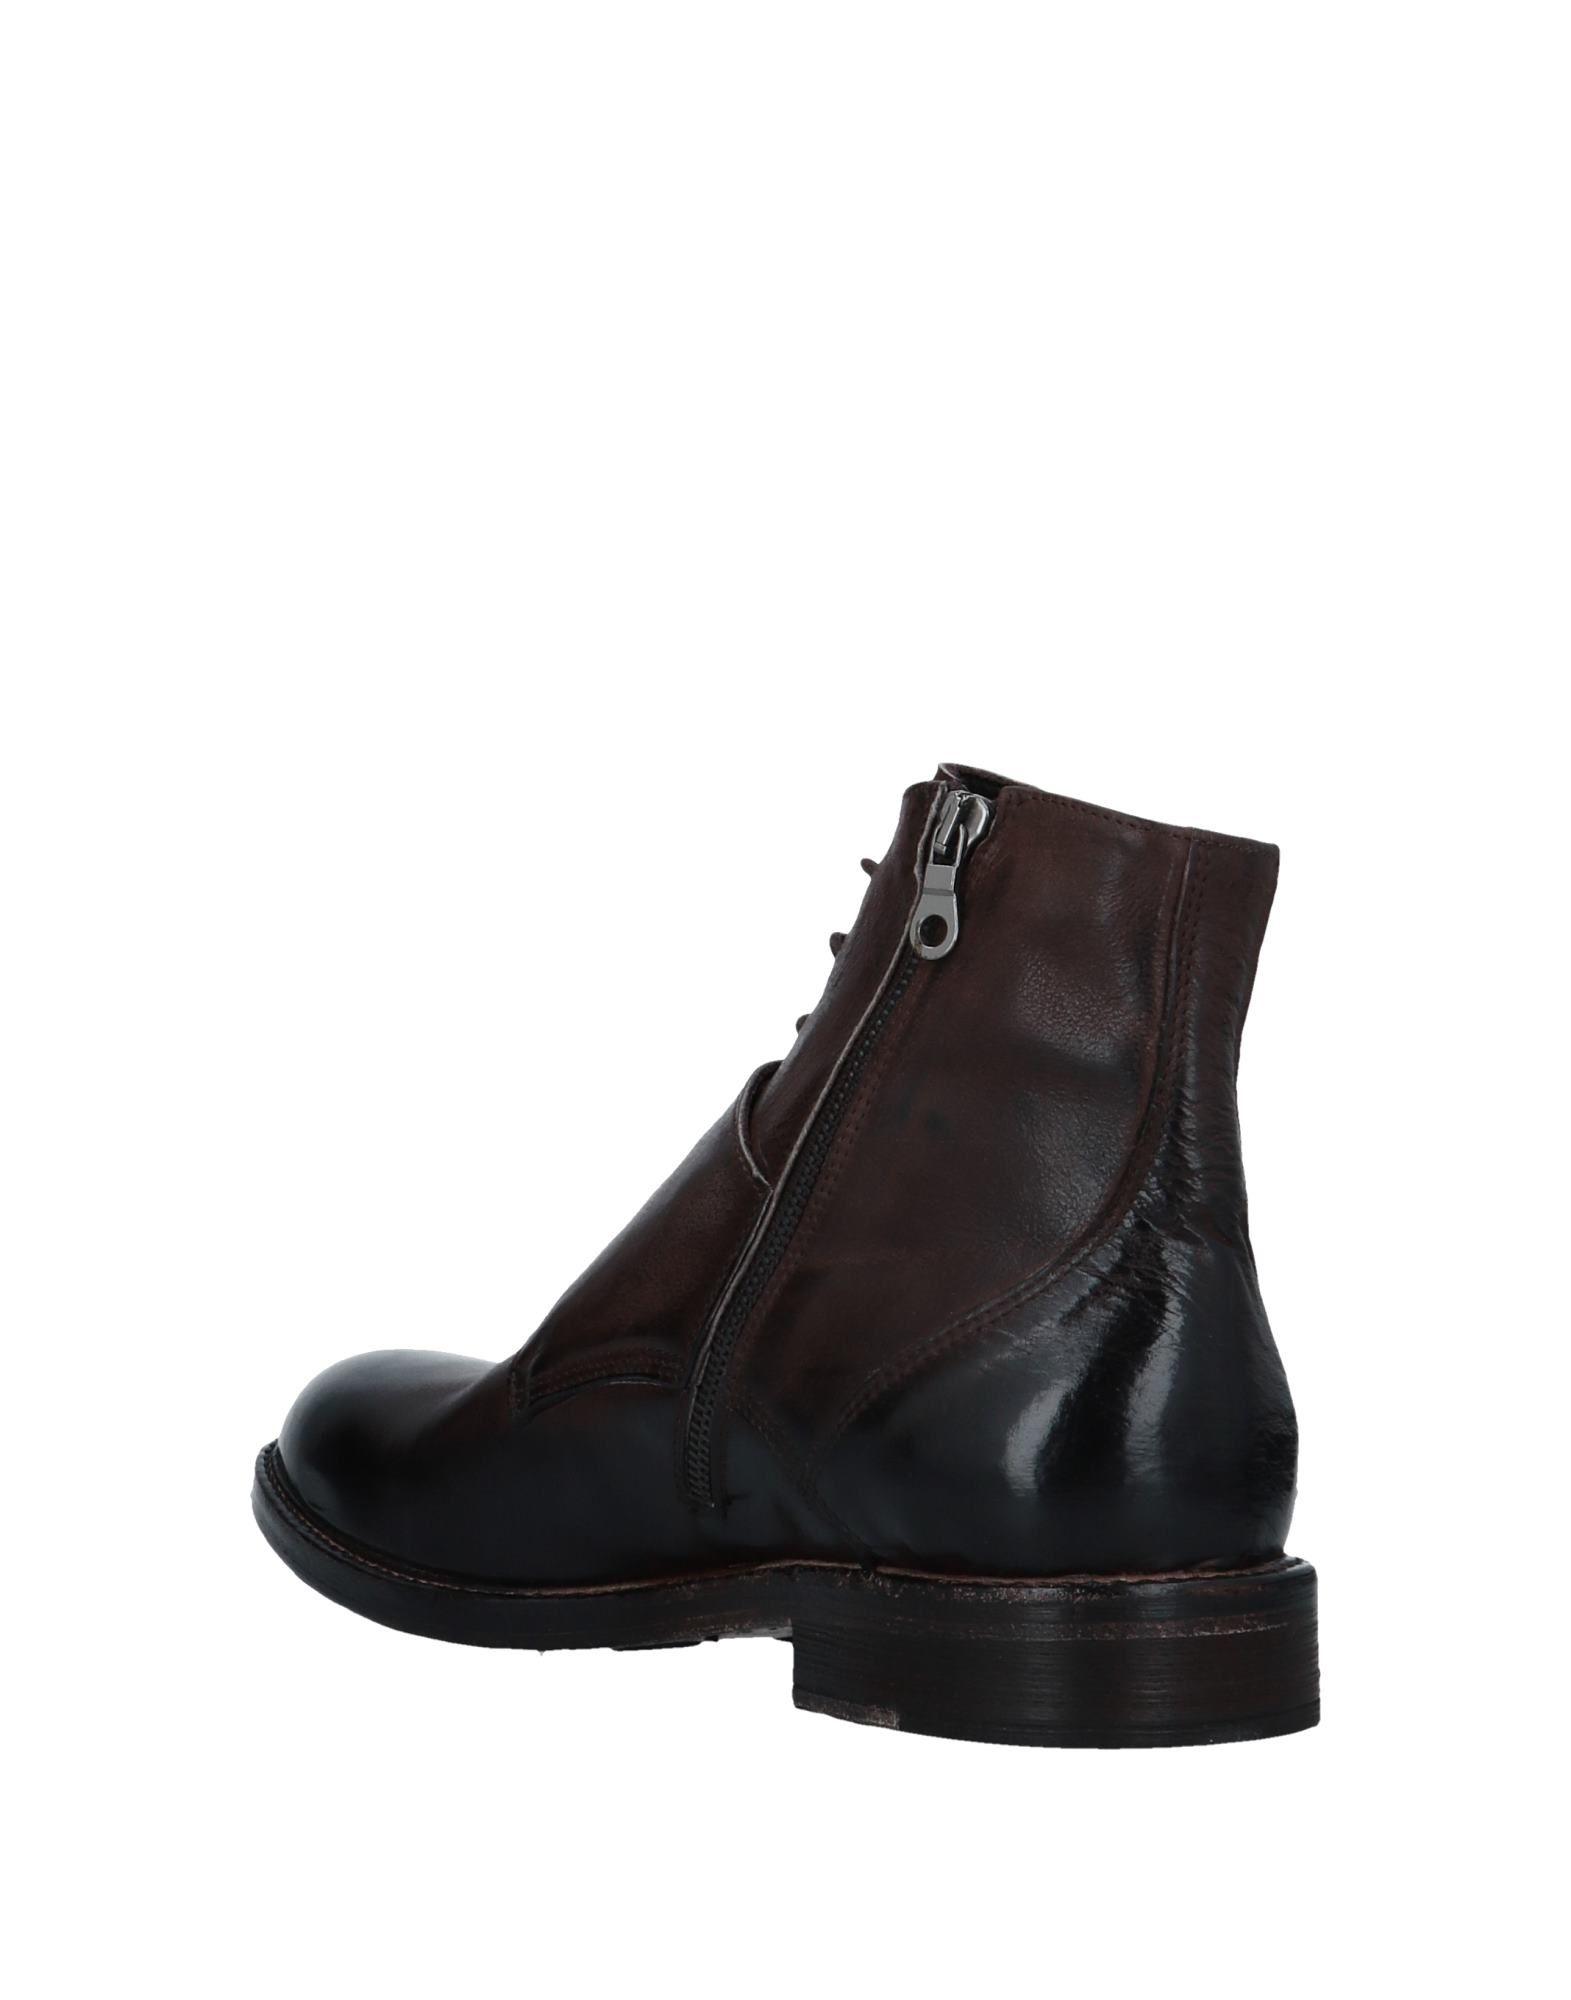 Rabatt echte Schuhe Savio  Barbato Stiefelette Herren  Savio 11536878OM a98a09